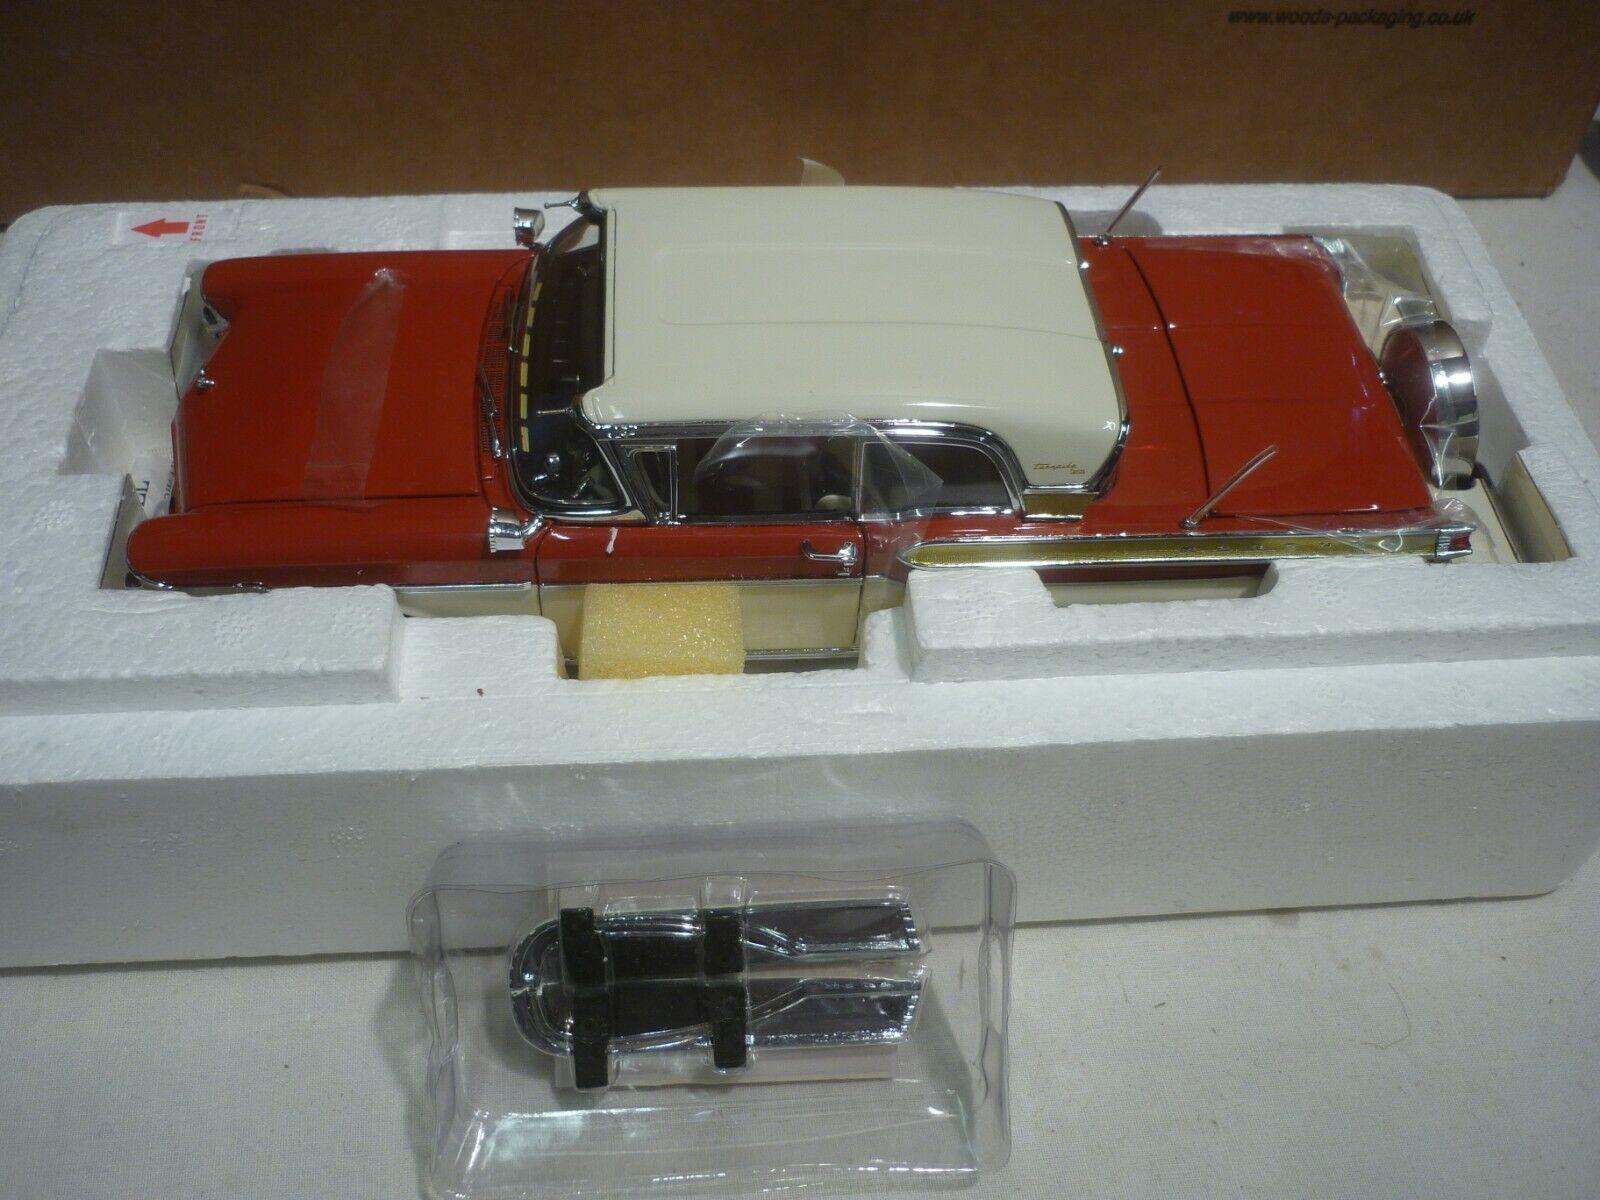 A la venta con descuento del 70%. Un modelo modelo modelo de escala de Danbury Mint de un 1957 Mercury Turnpike Cruiser. en Caja  Ven a elegir tu propio estilo deportivo.